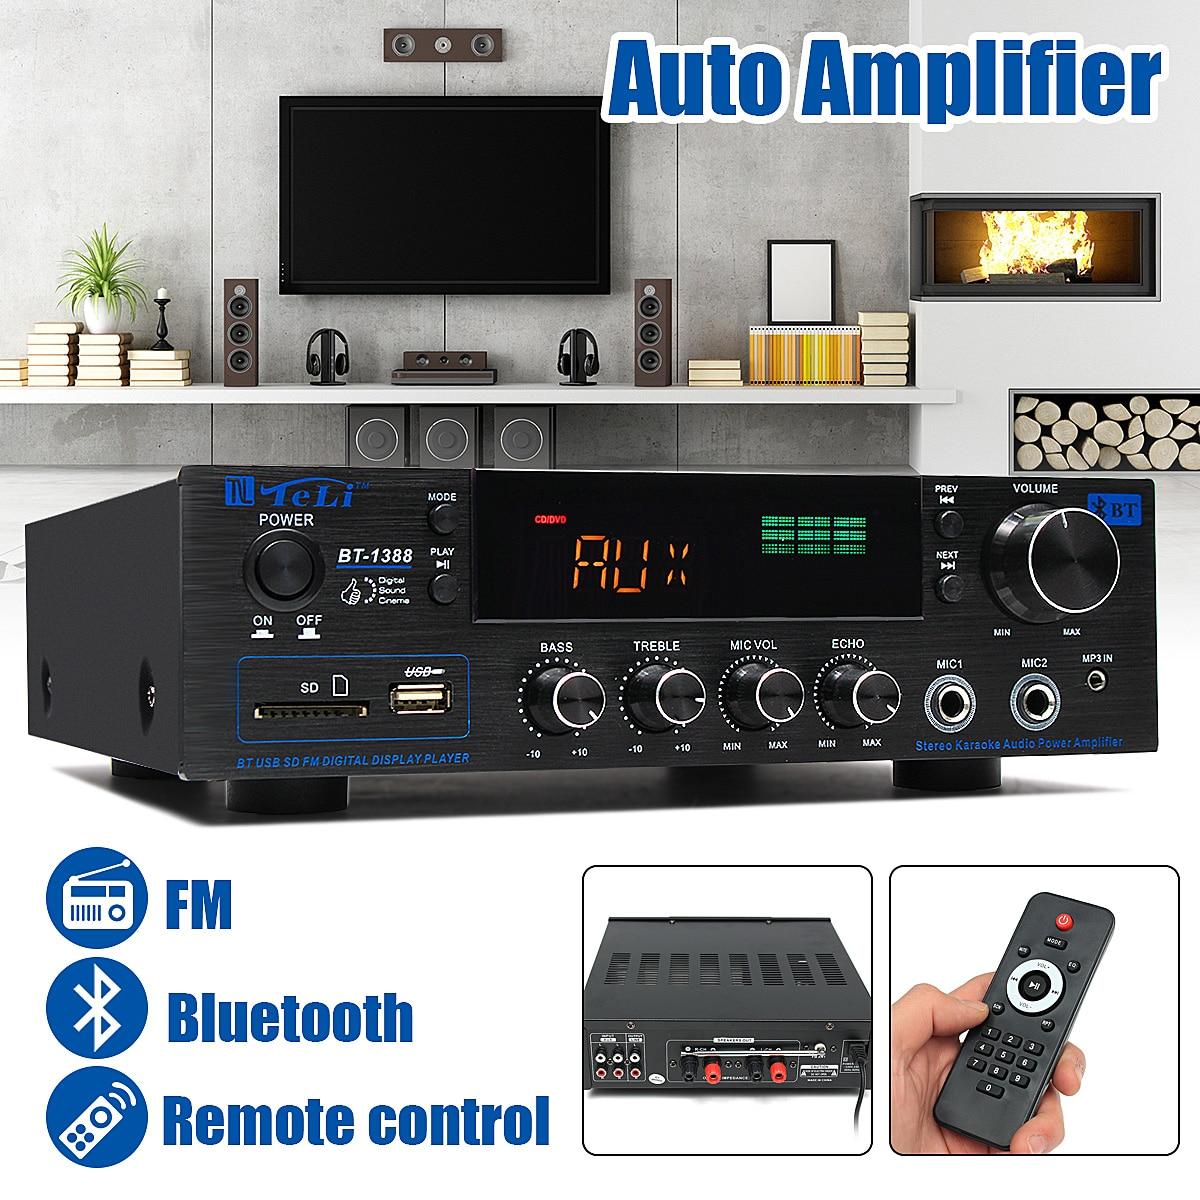 220V-240V 1388 2*200W Bluetooth Stereo 2.0 Amplifier HiFi Power Remote Control USB SD Aux Mic Input Auto Amplifier